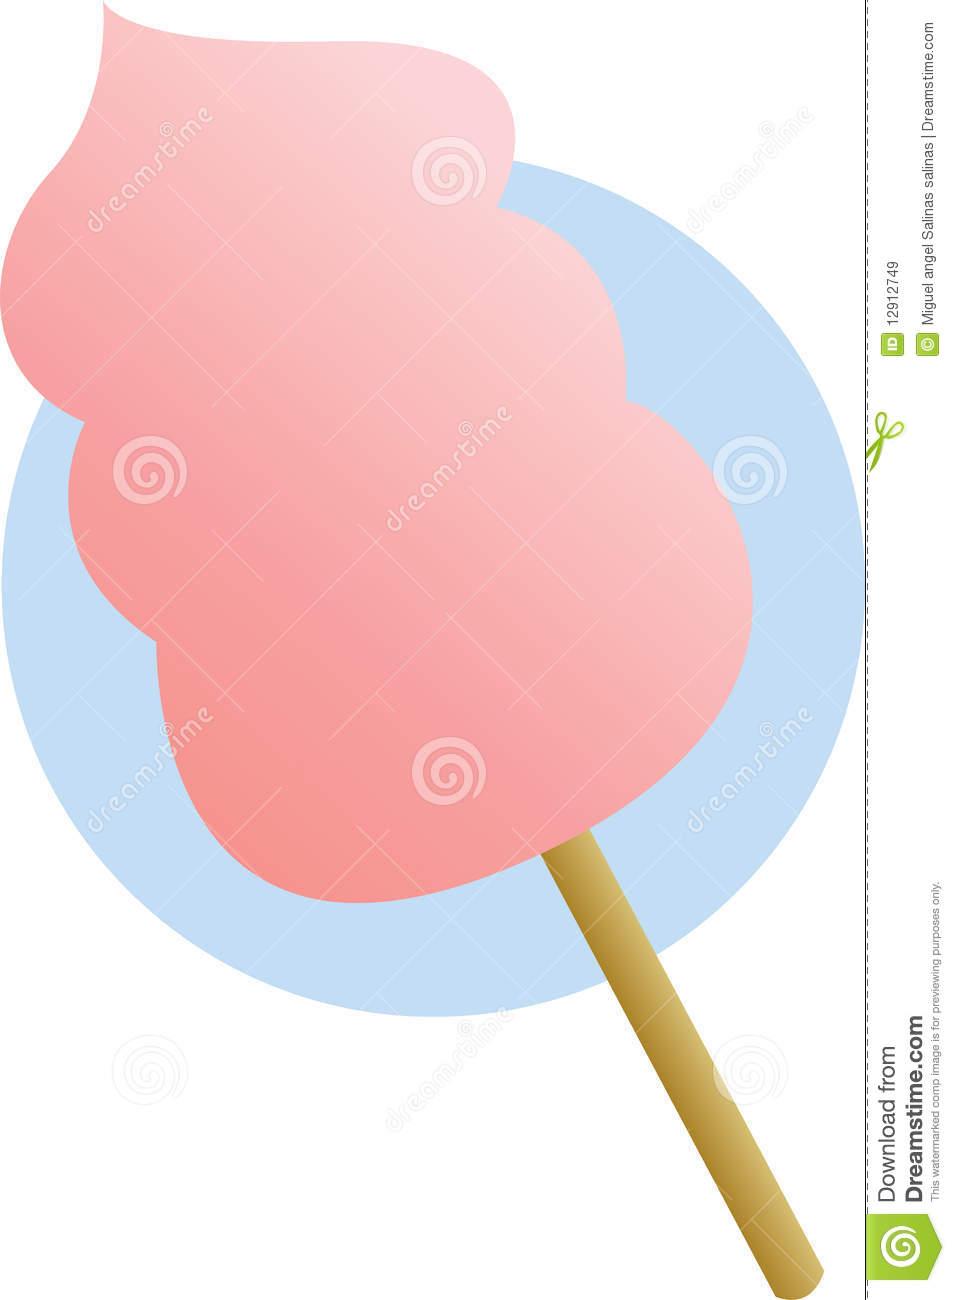 955x1300 Cotton Candy Clipart Stick